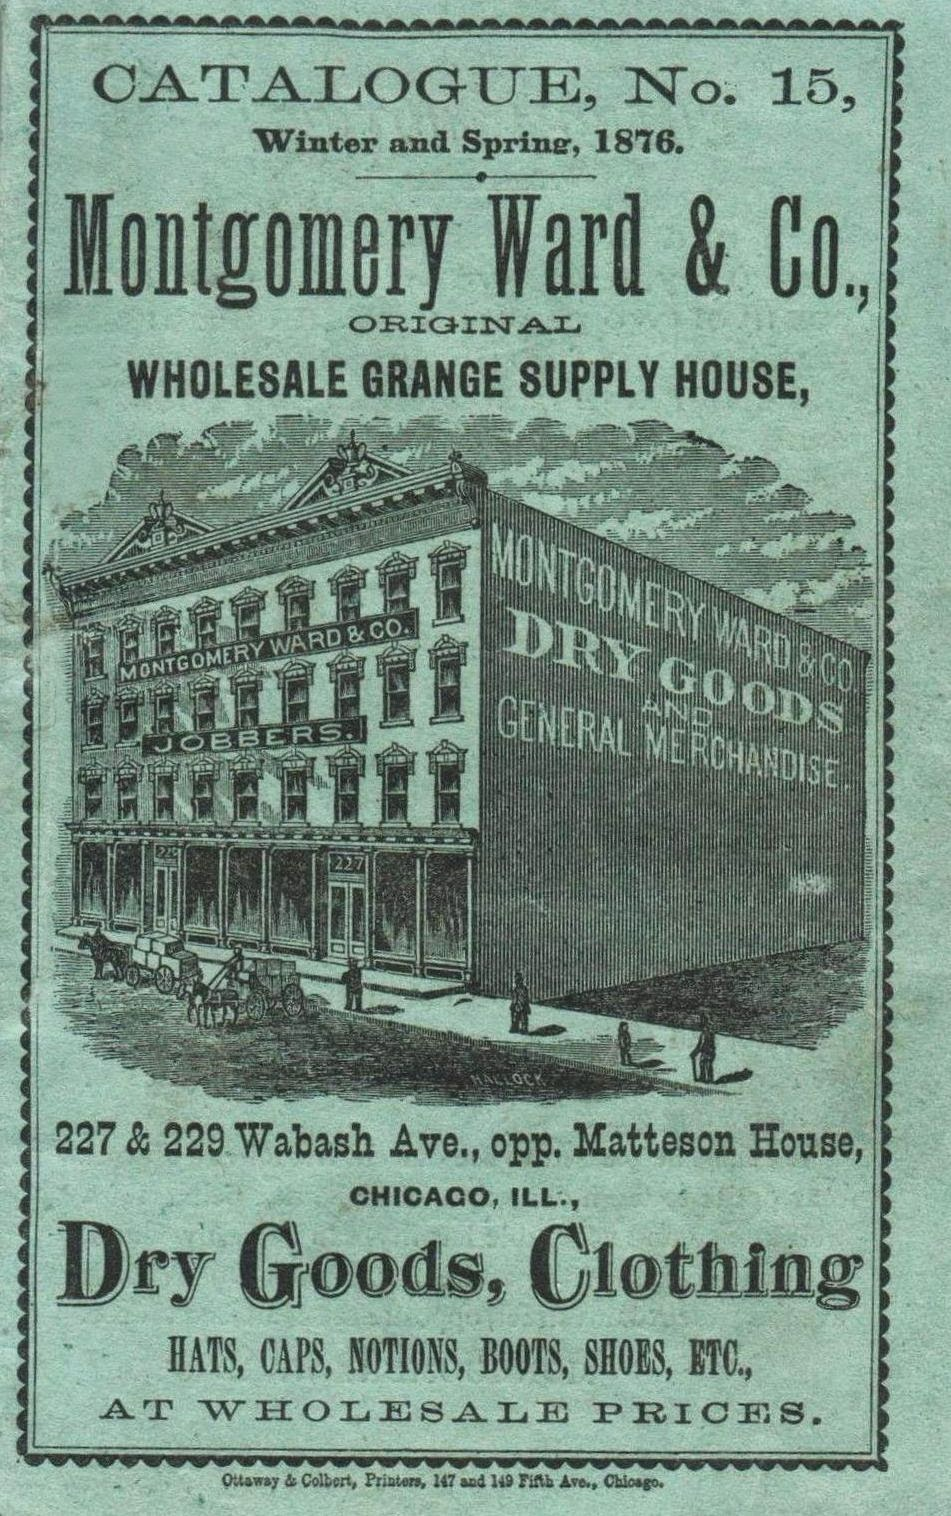 Montgomery Ward & Co. Catalogue